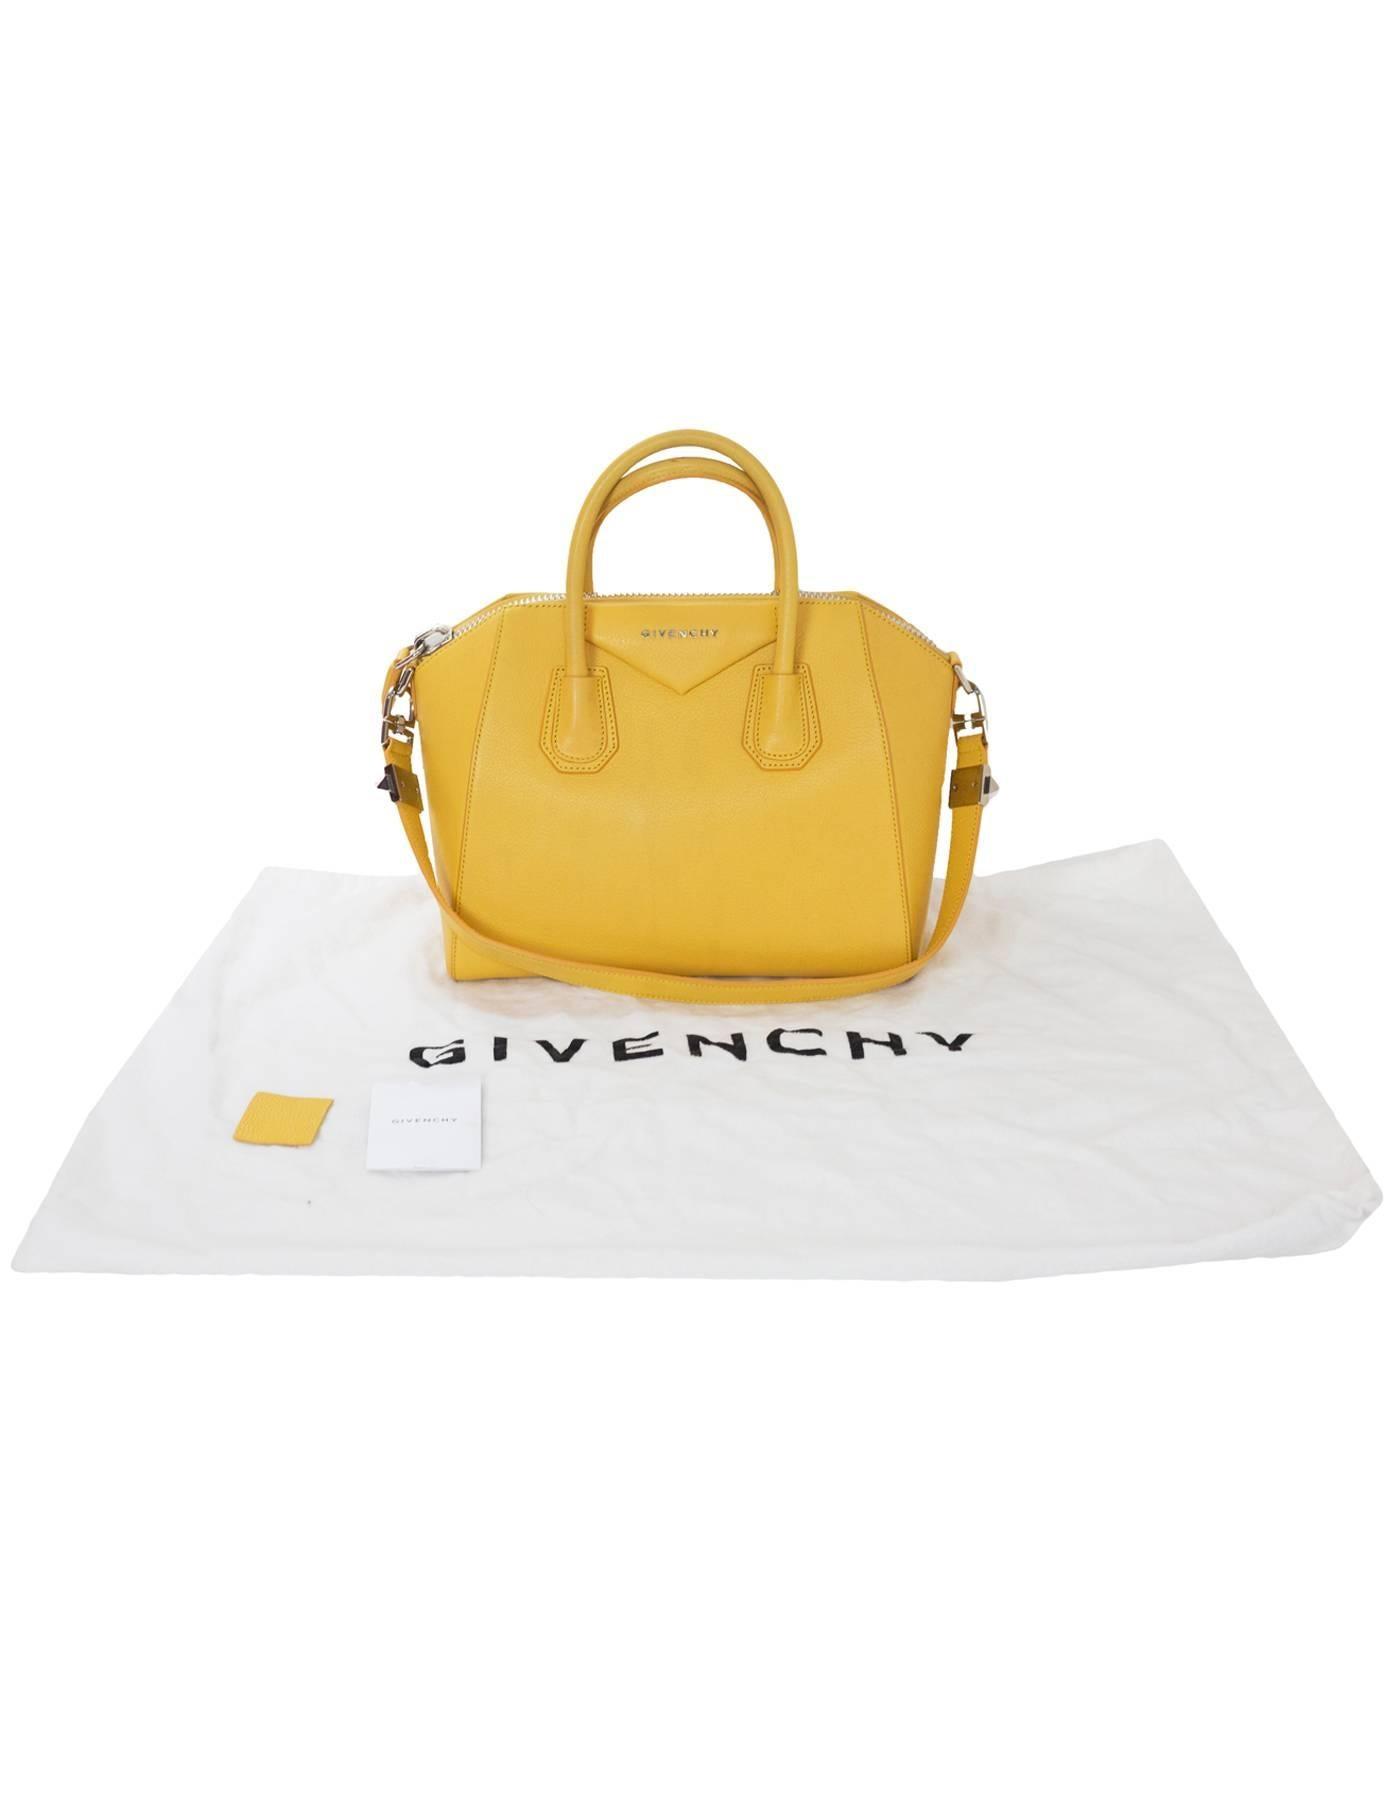 Givenchy Yellow Leather Small Antigona Satchel